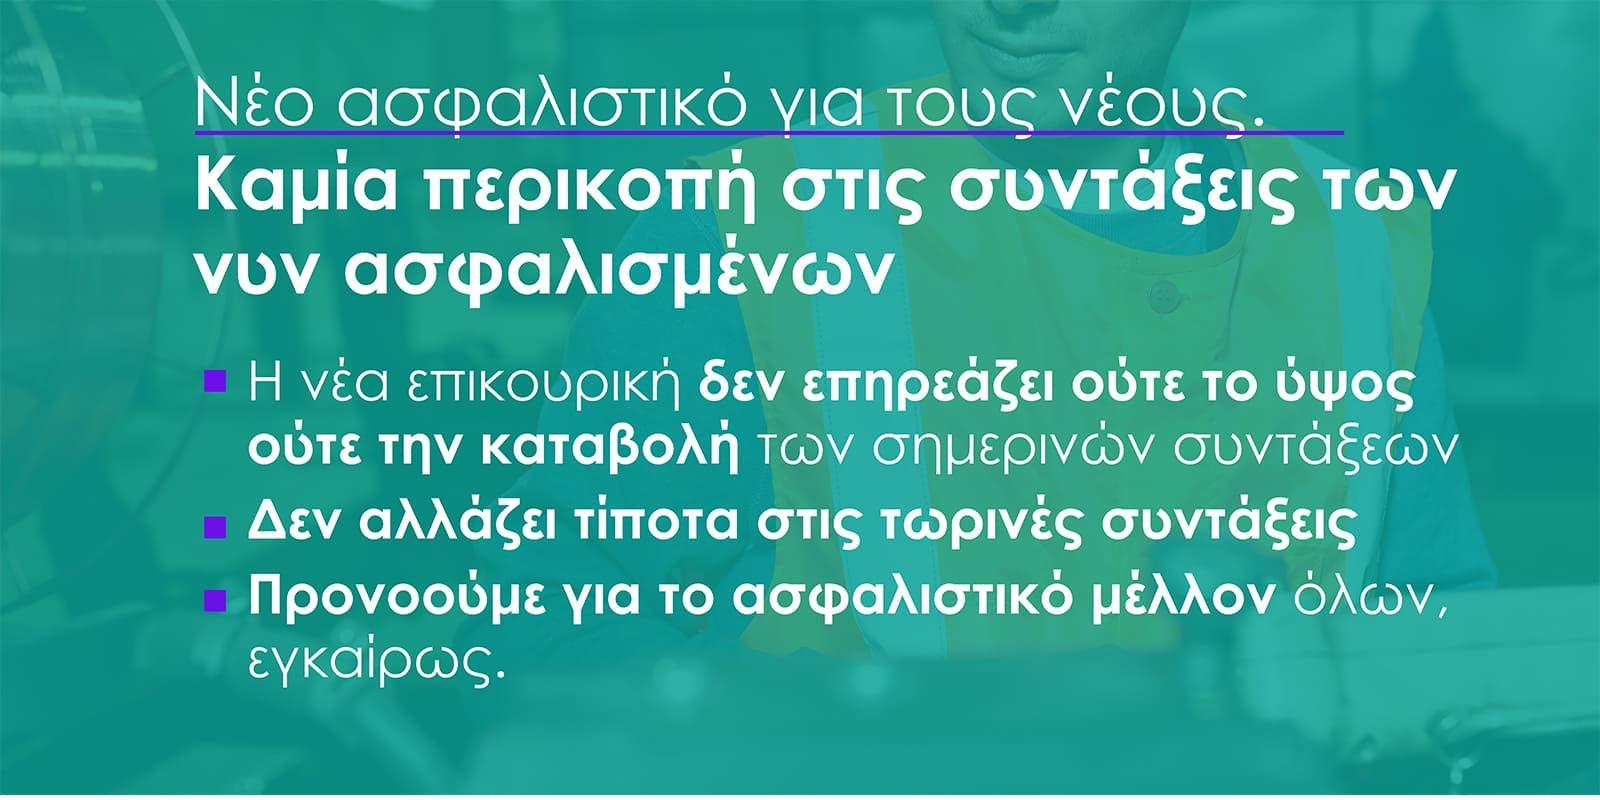 asfalistiko_neoi_HQ-3